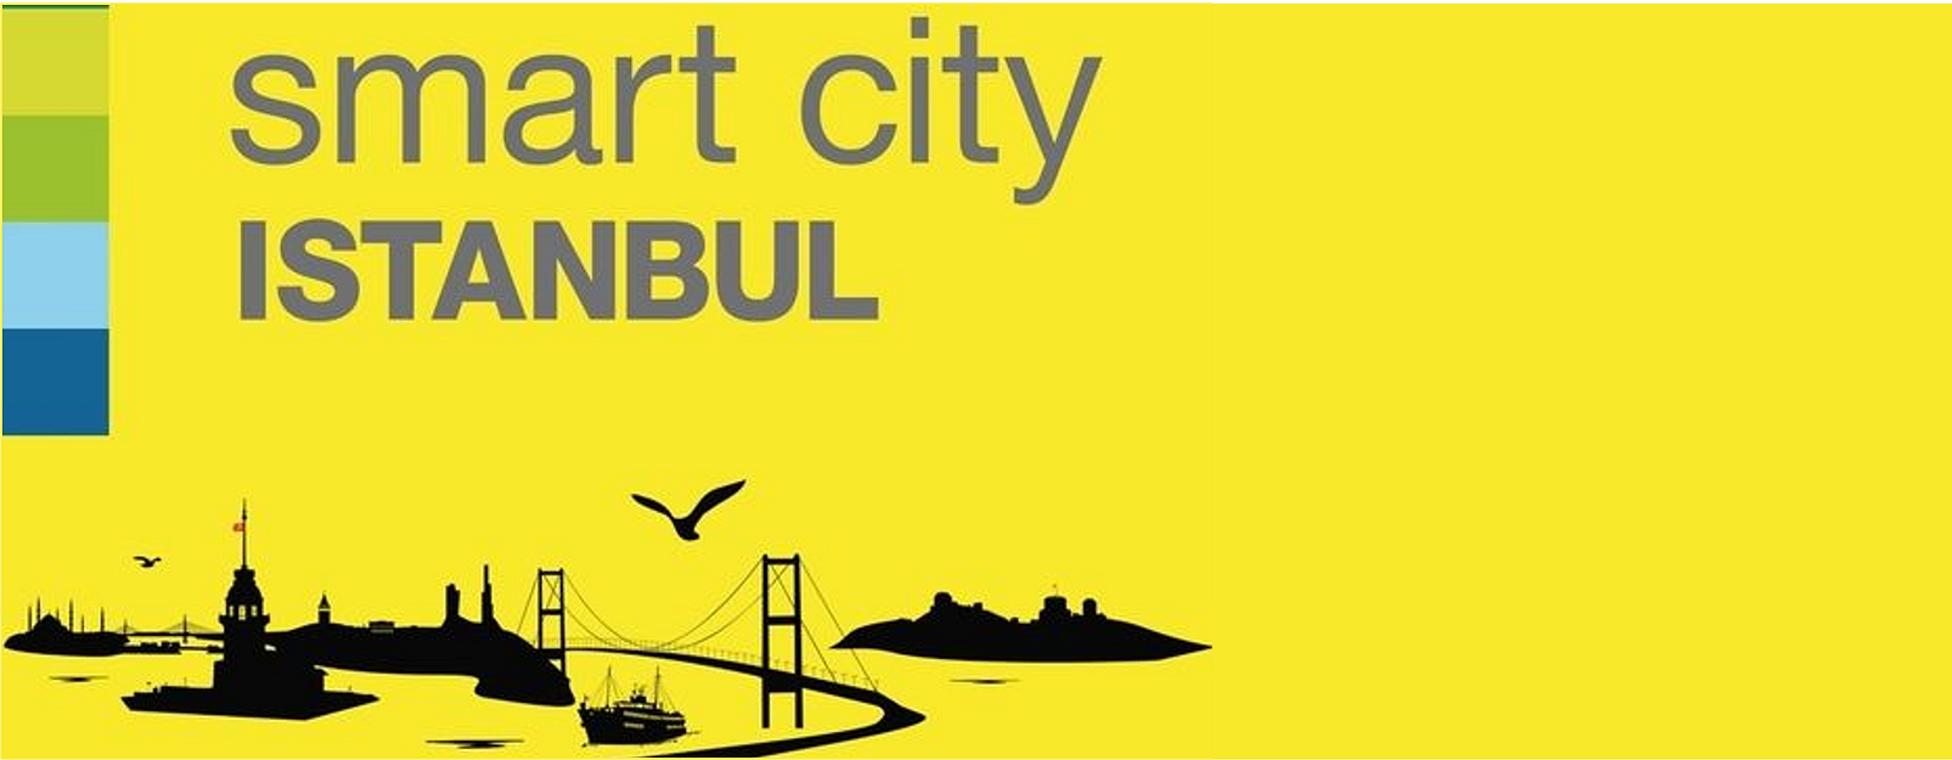 Istanbul Smart City